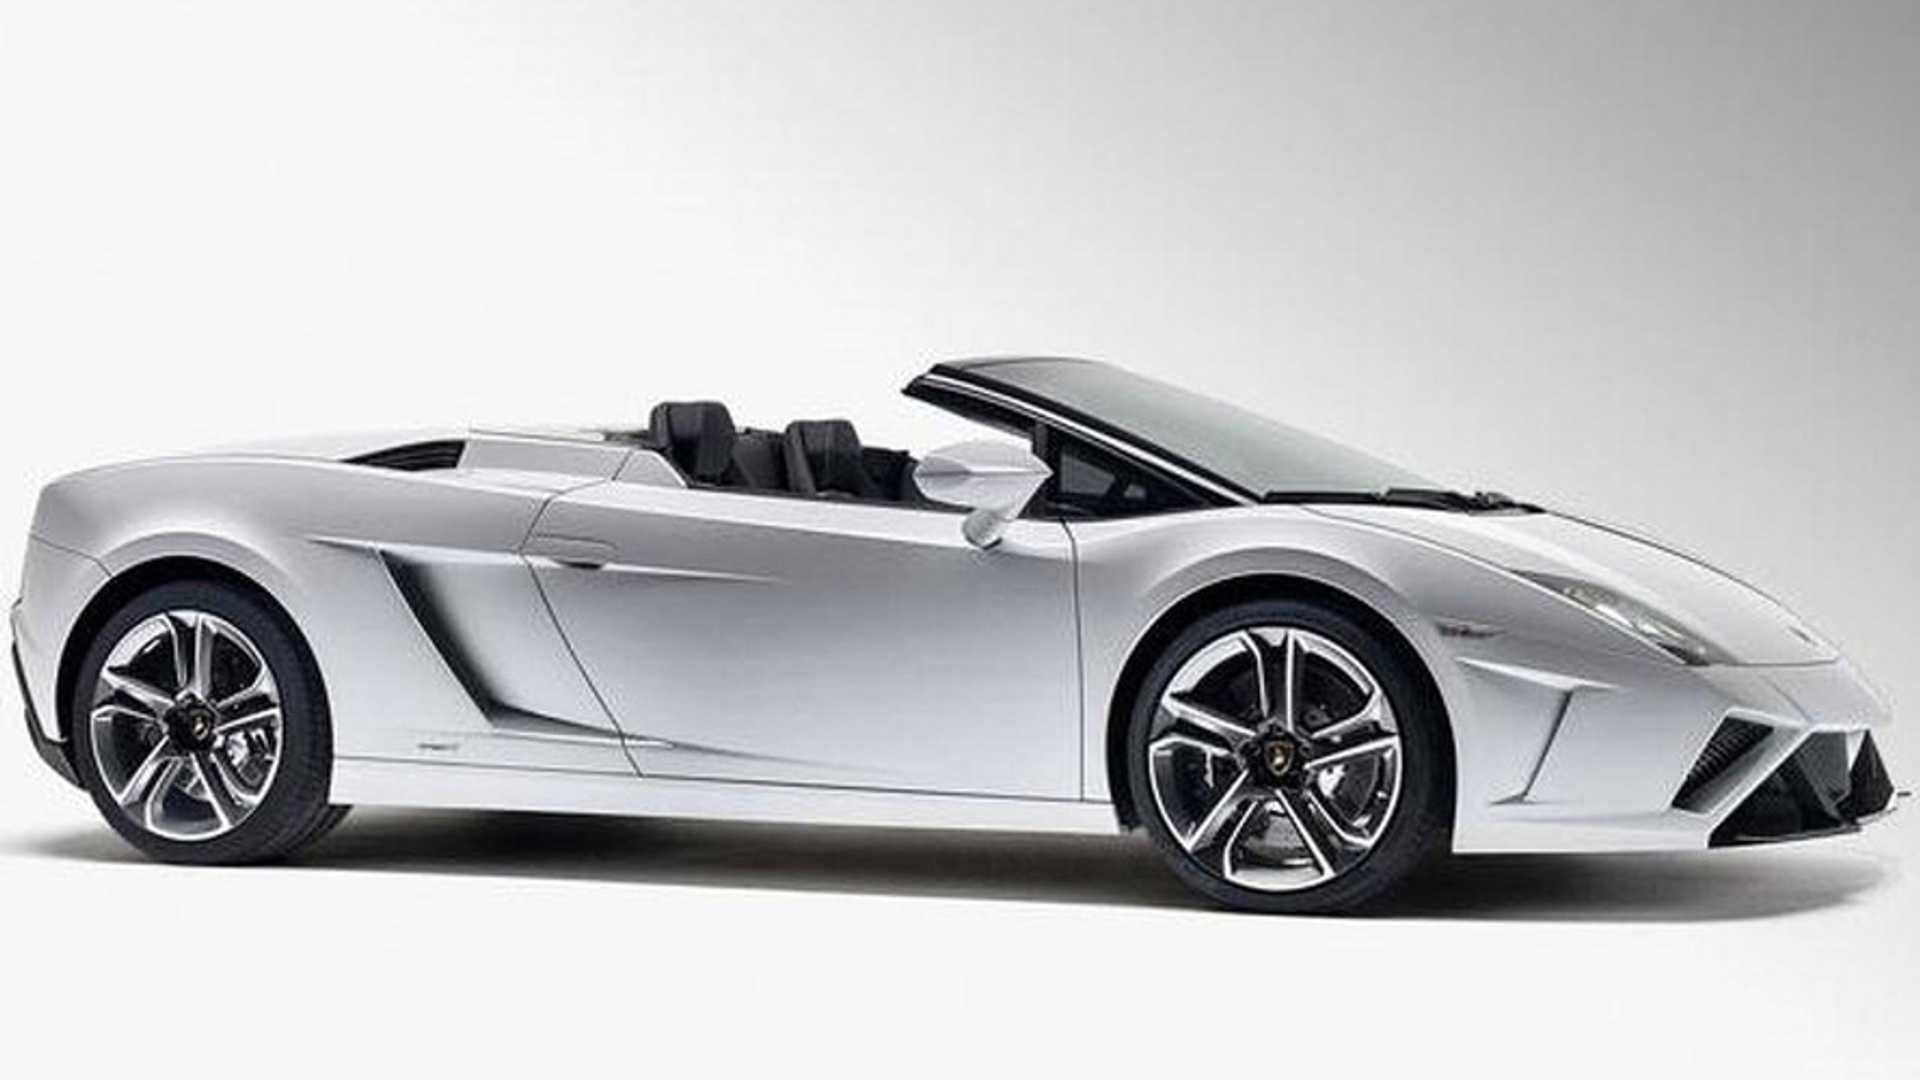 OFFICIAL 2013 Lamborghini Gallardo Spyder Revealed